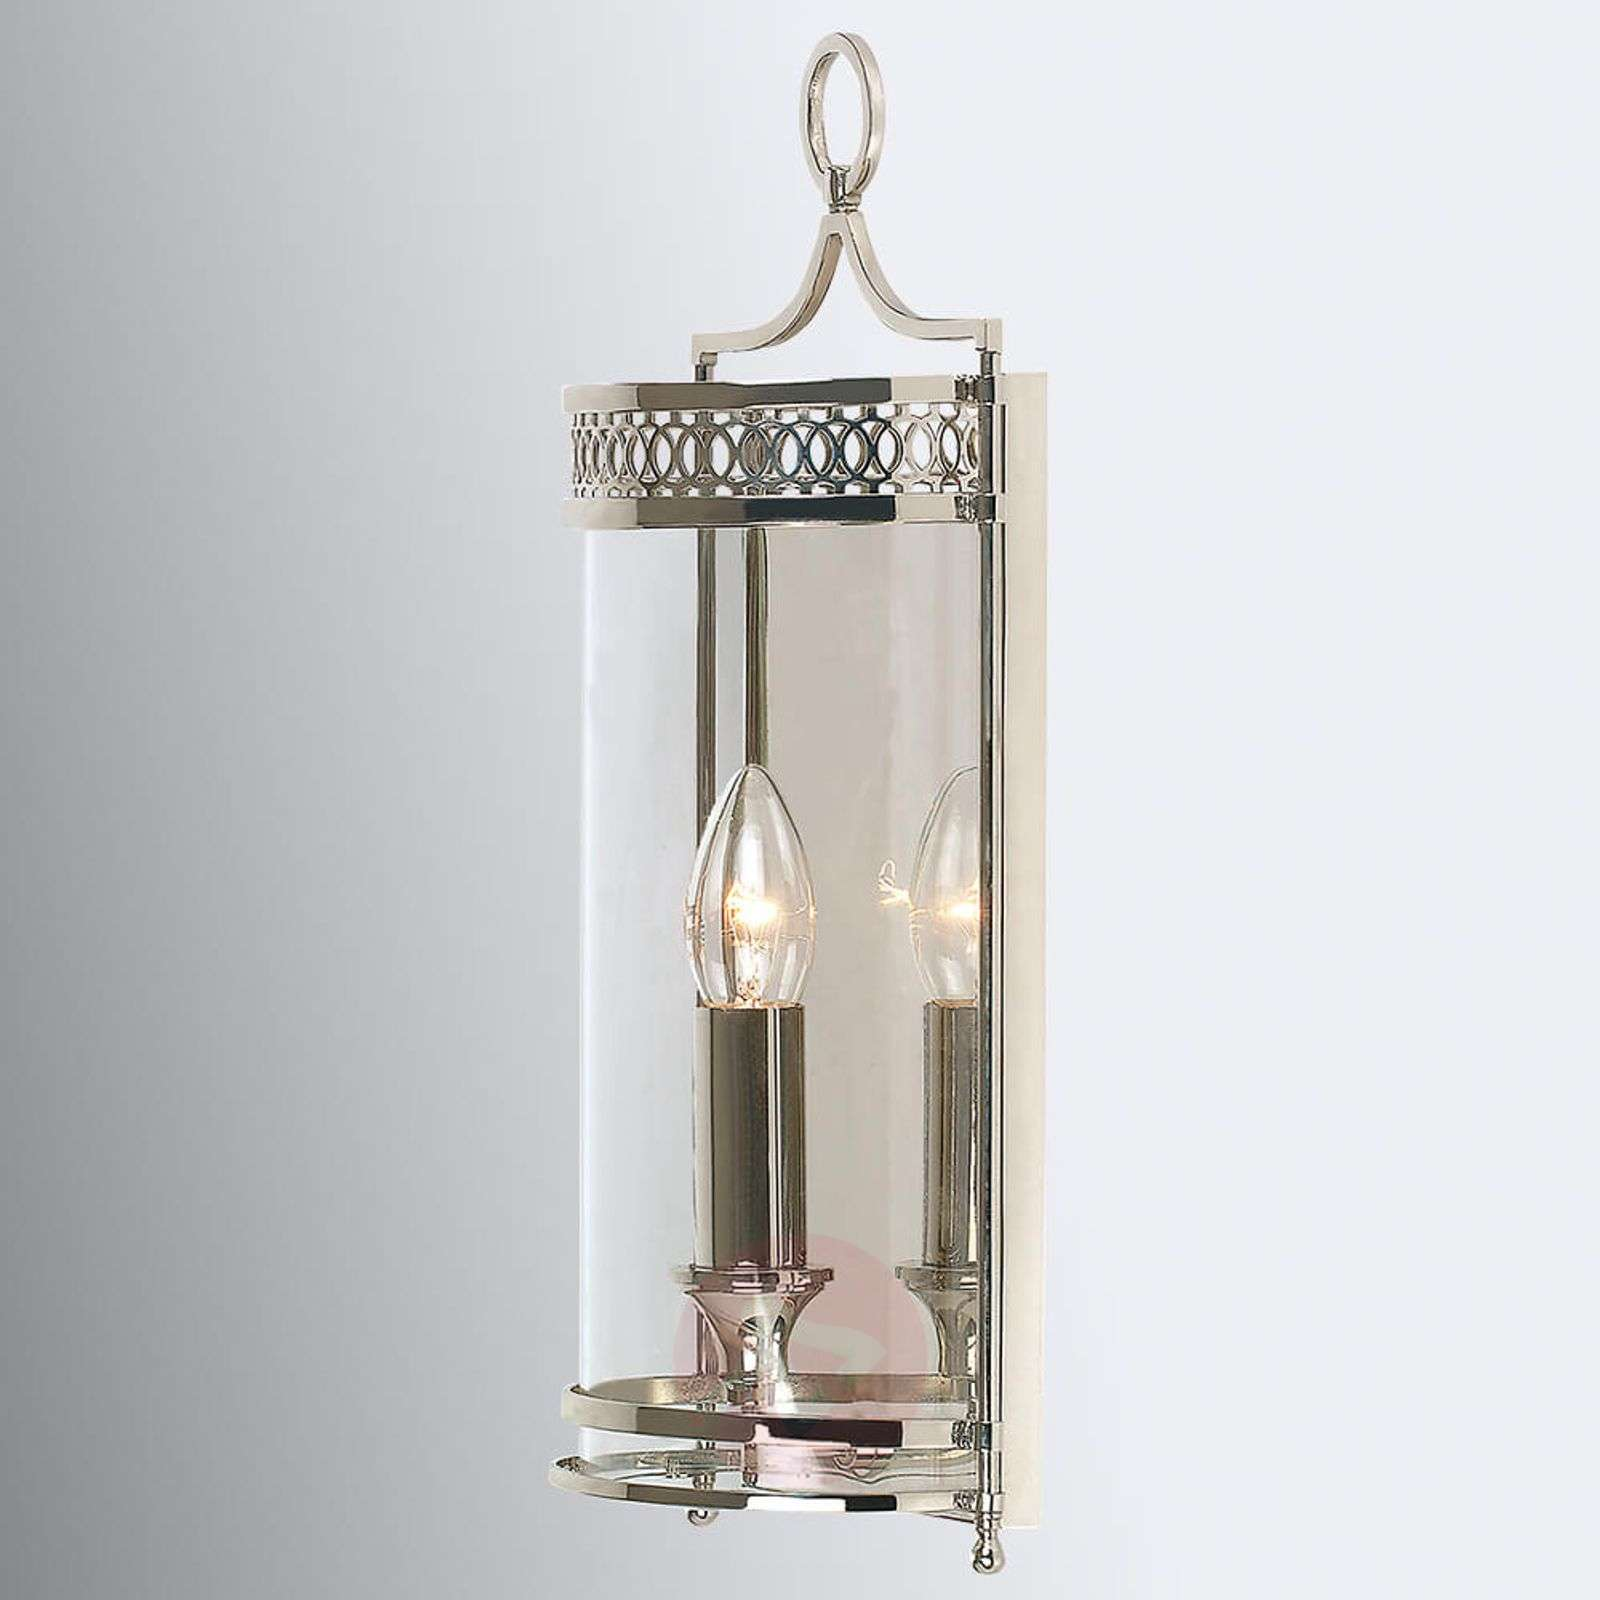 Stylish wall lamp Guildhall-3048575-01